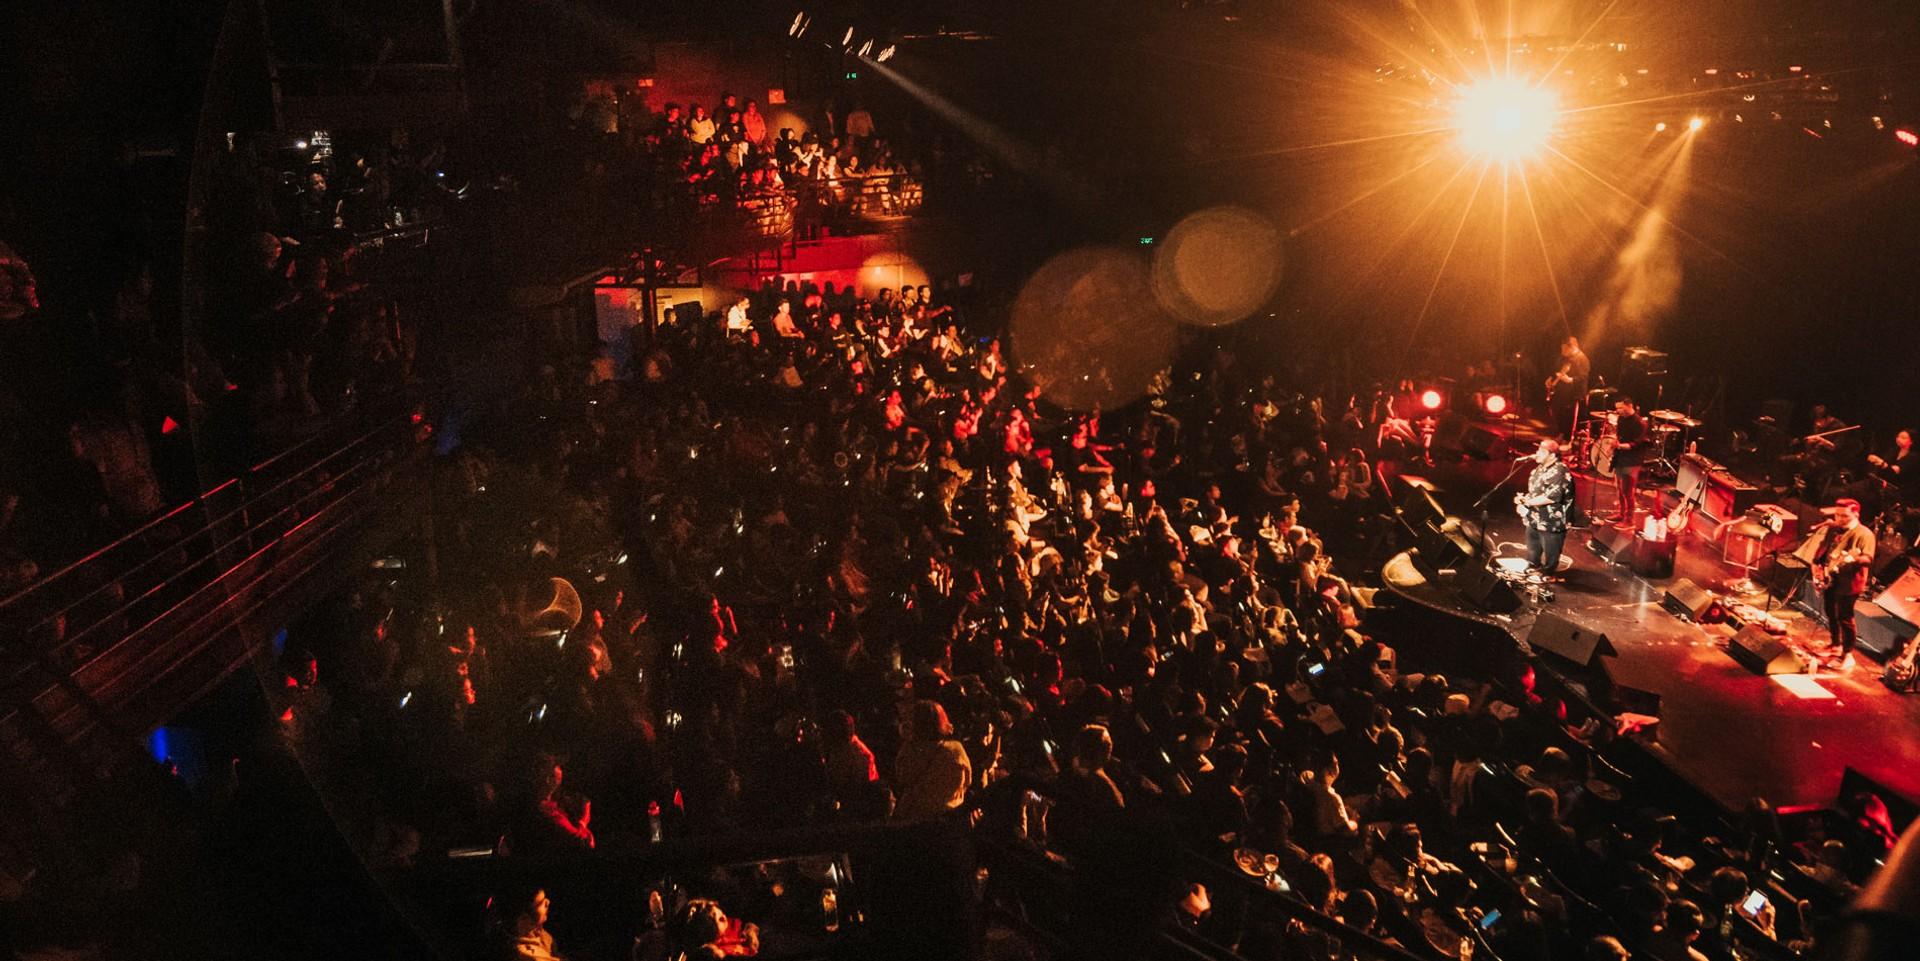 FILSCAP to celebrate Linggo ng Musikang Pilipino with Songwriters' Night SELECT: Year 2